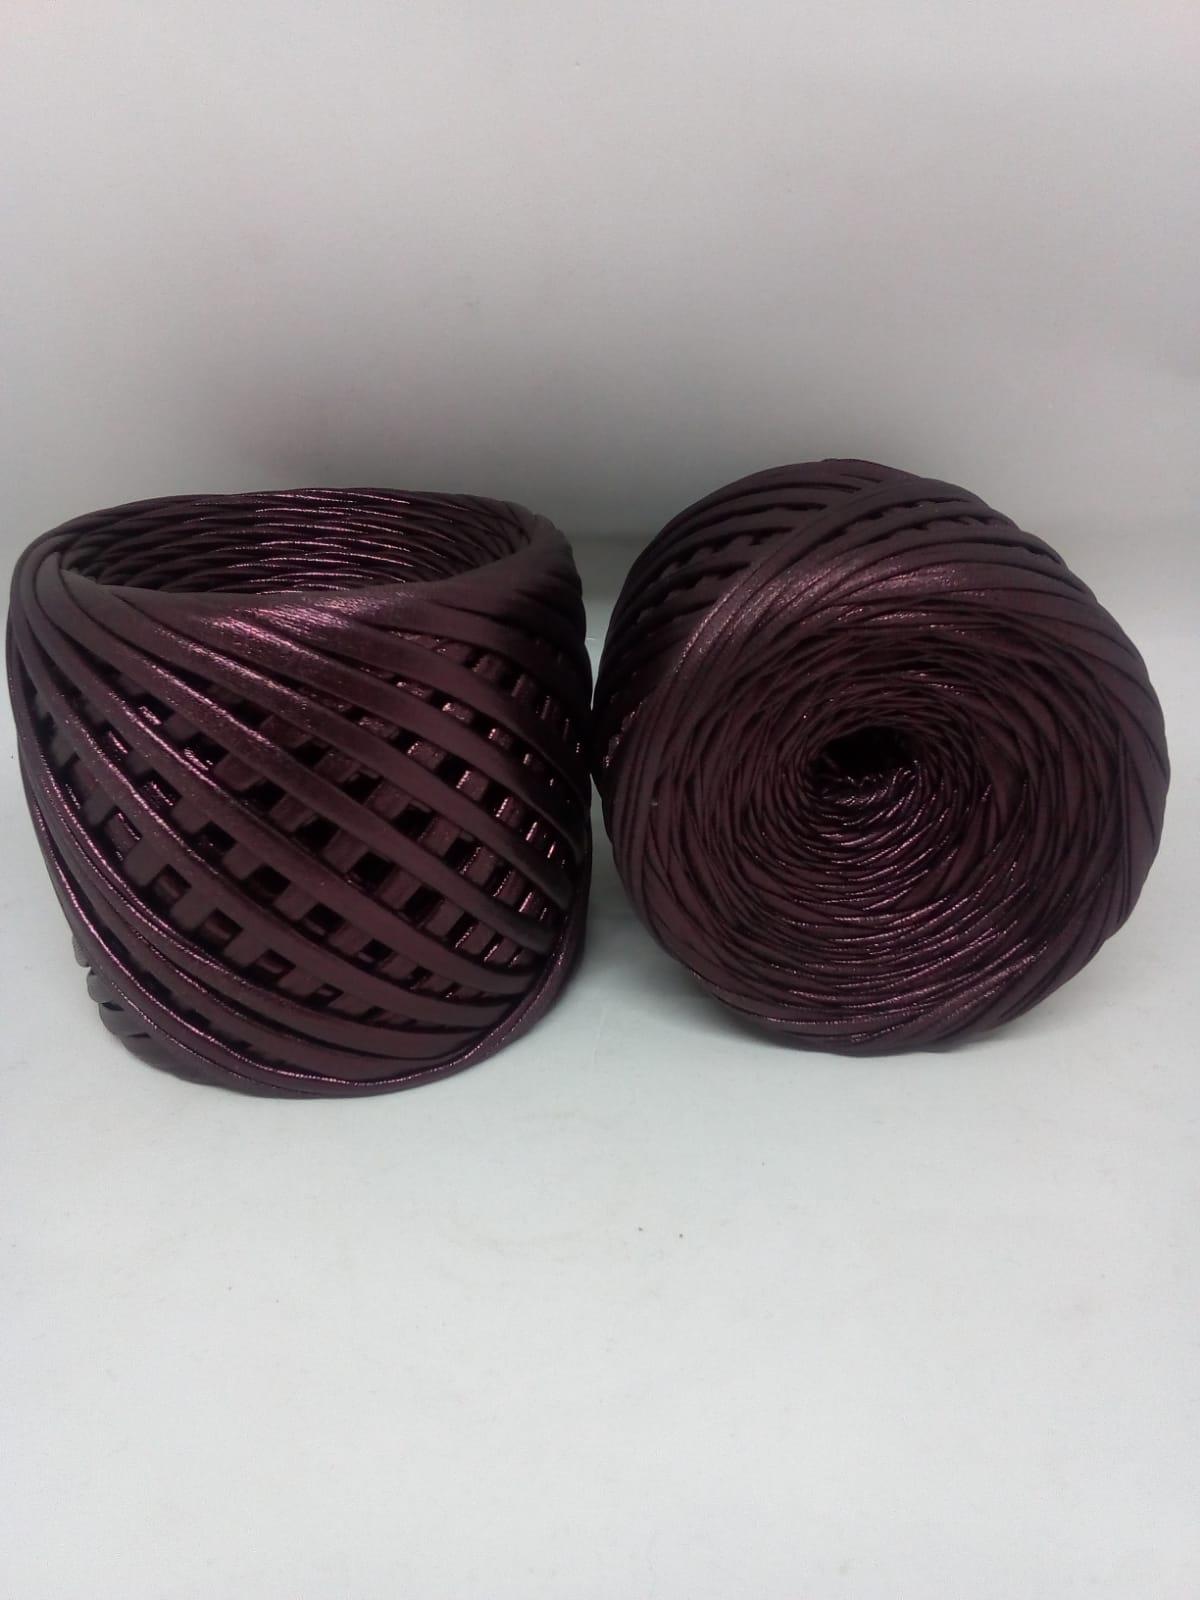 Maccaroni Metallic (Маккарони металика) 8 - блистающий шоколад заказать с доставкой по Беларуси